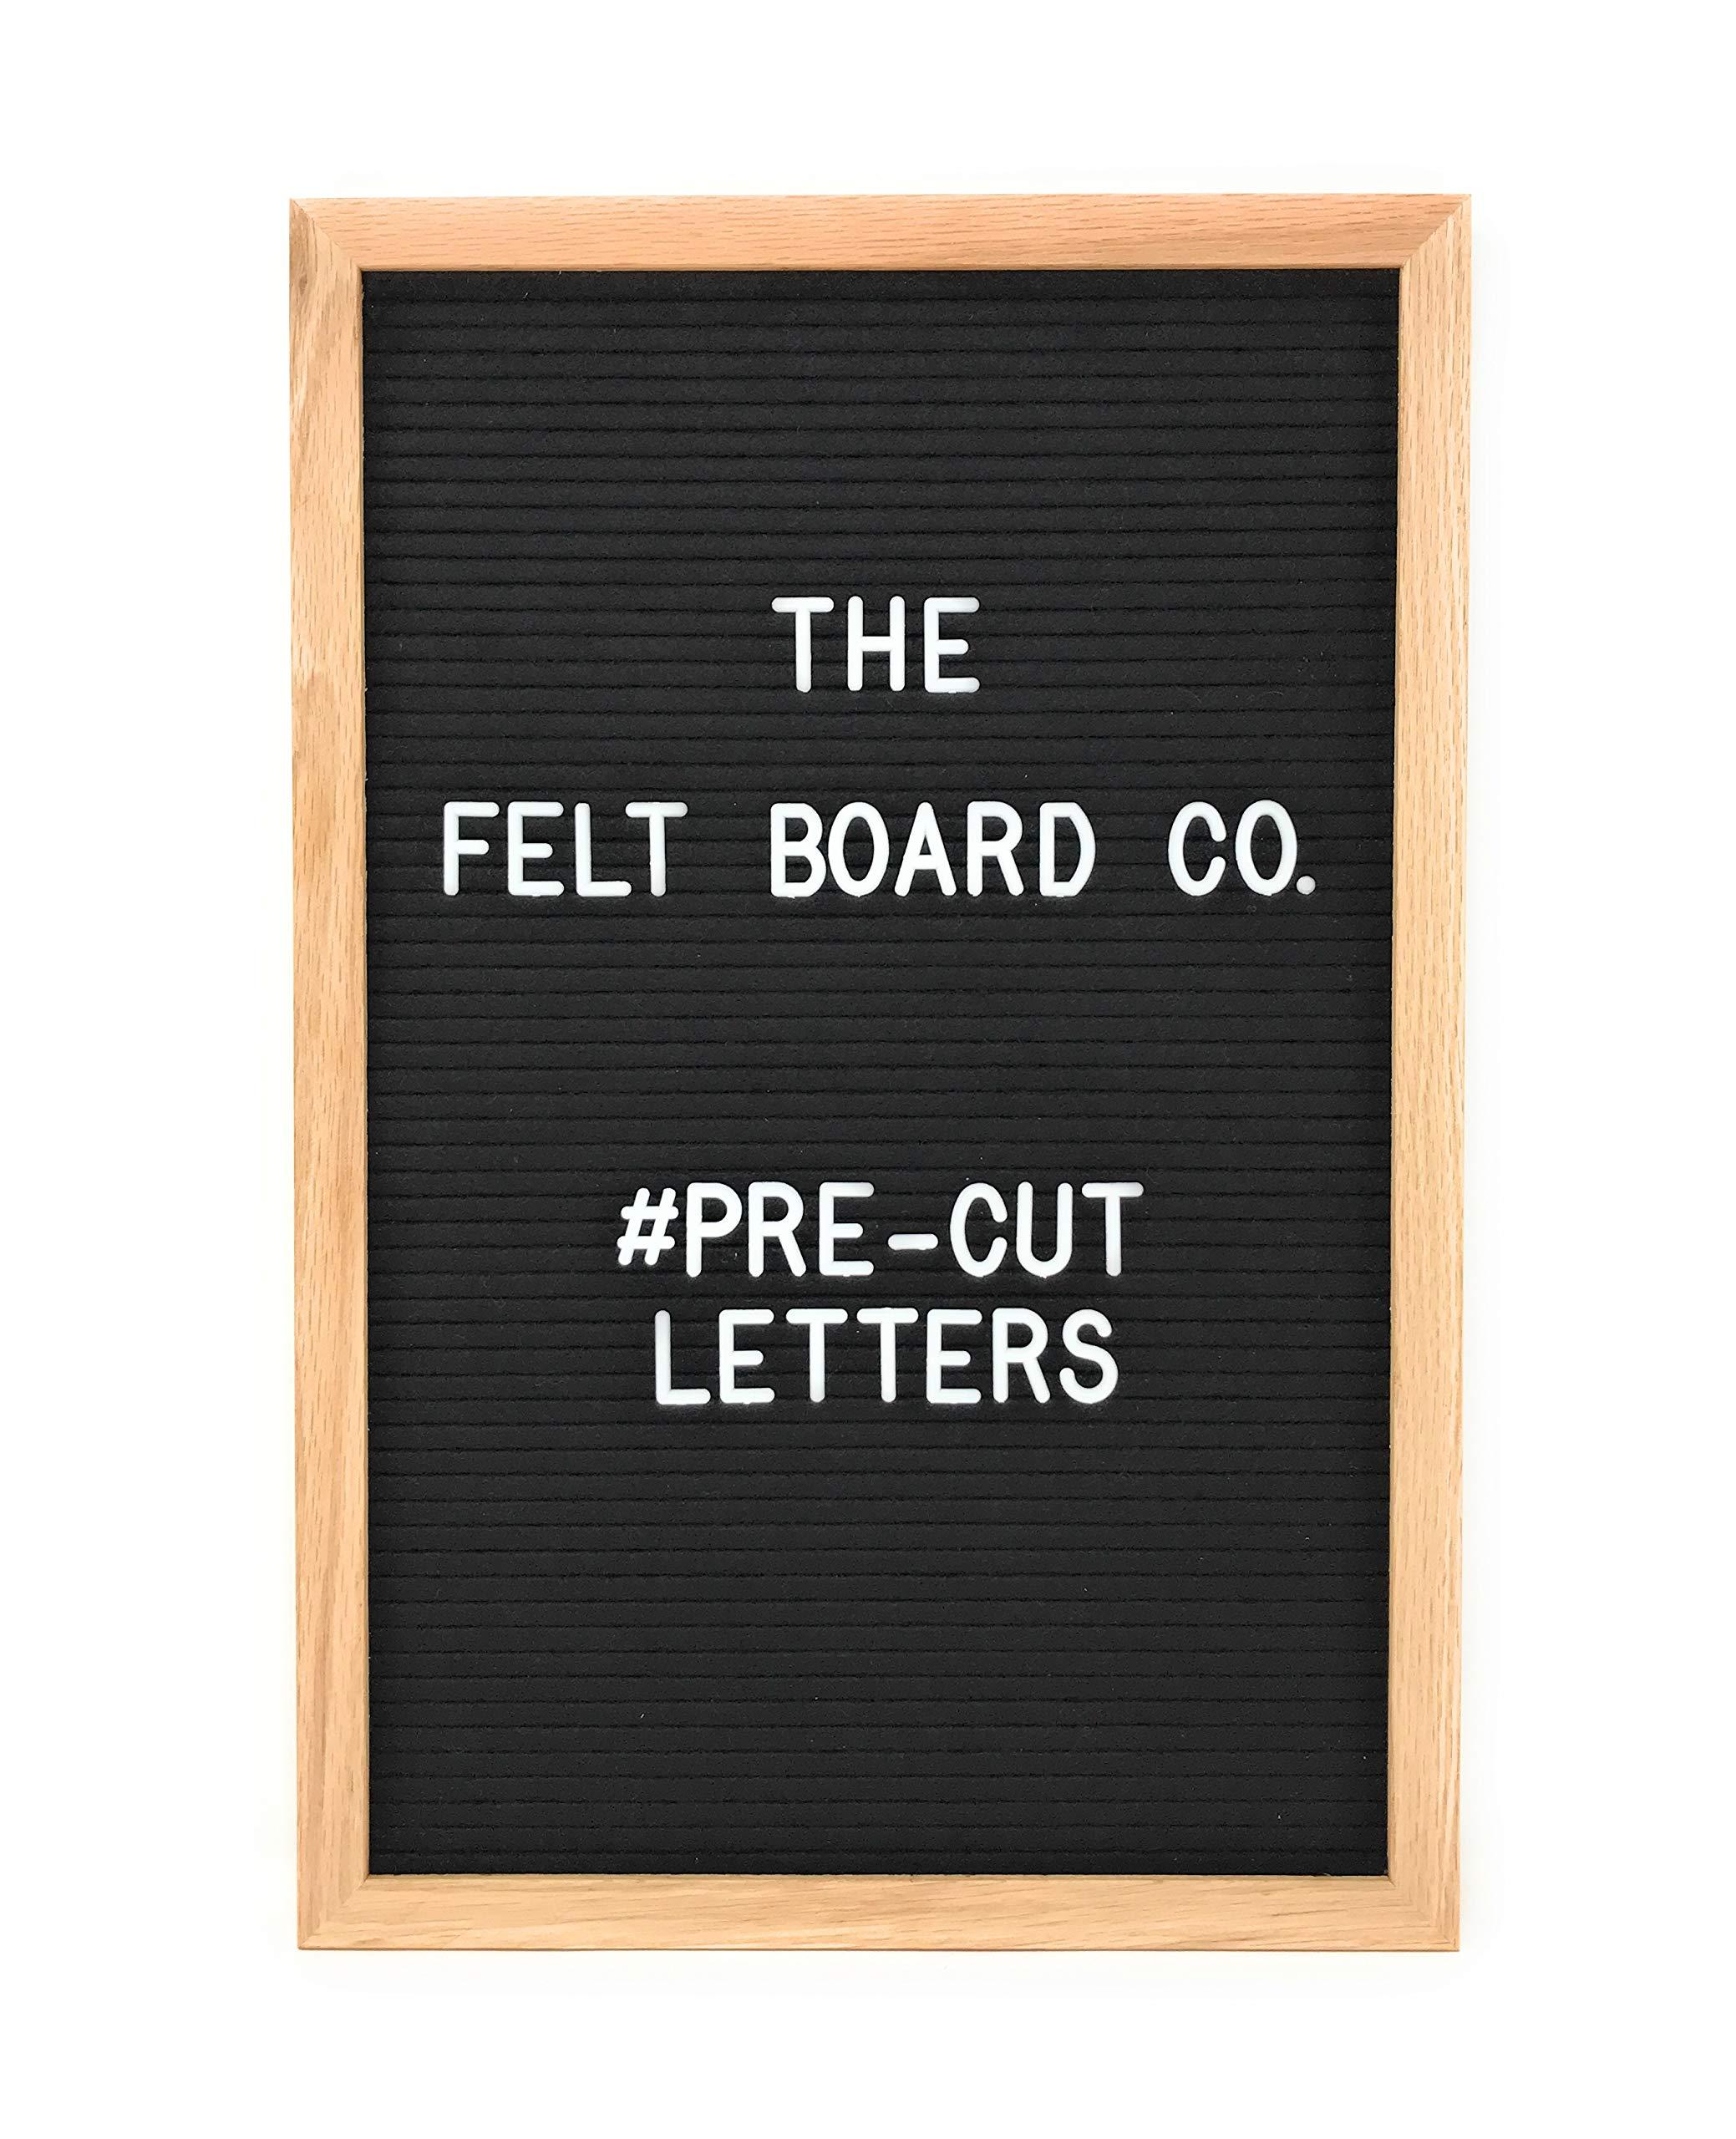 Black Felt Letter Board 12x18 Premium Bundle w/ 612 PRE-Cut Changeable Letters, Symbols, Emojis Includes Both 1 inch and 3/4 inch Sizes + Sorting Case + Cursive Word Pack + Canvas Bag w/Oak Frame